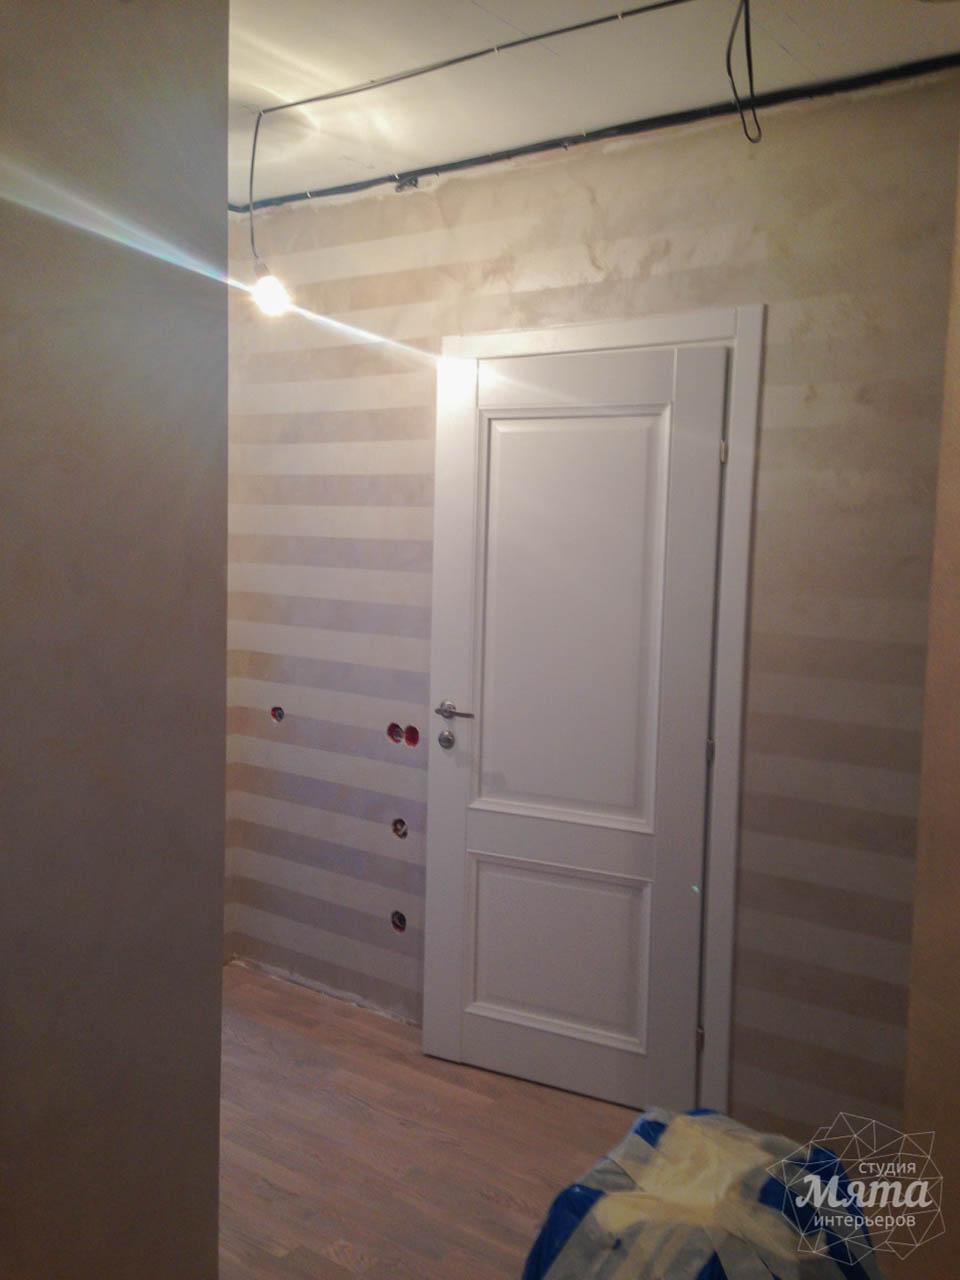 Дизайн интерьера и ремонт трехкомнатной квартиры по ул. Фучика 9 48